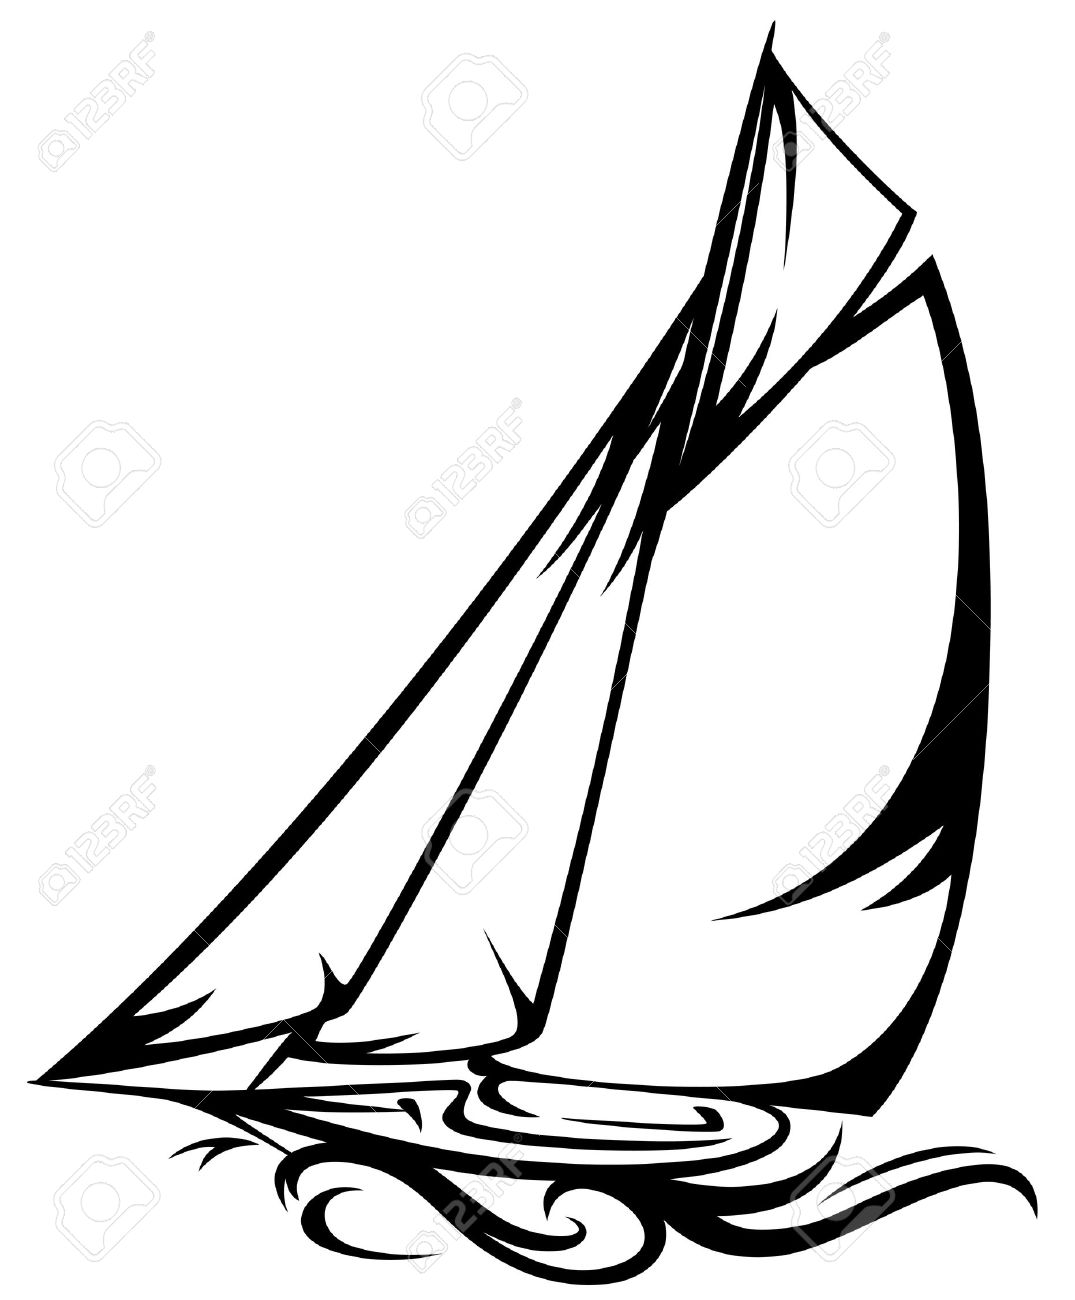 sailing yacht illustration.